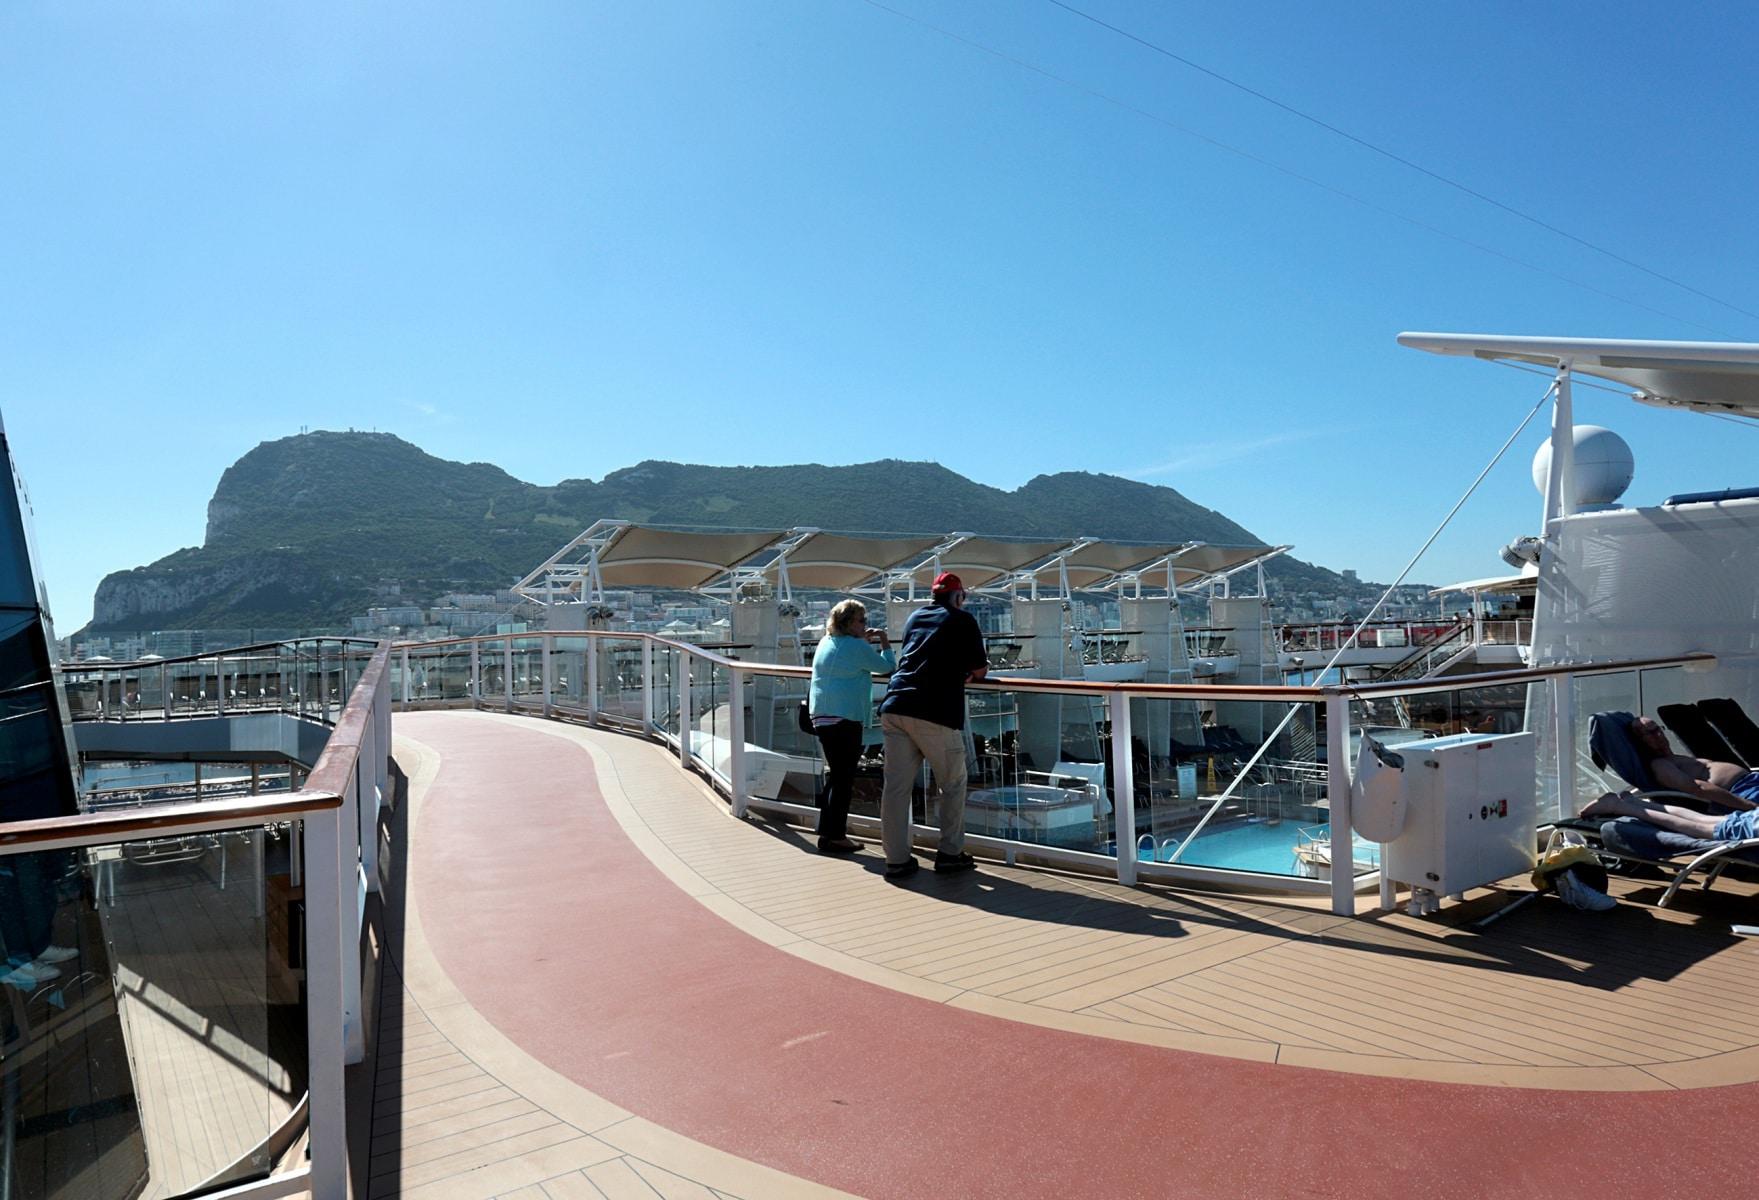 08-may-2017-17visita-inaugural-del-crucero-celebrity-or-reflection-a-gibraltar_34353151130_o